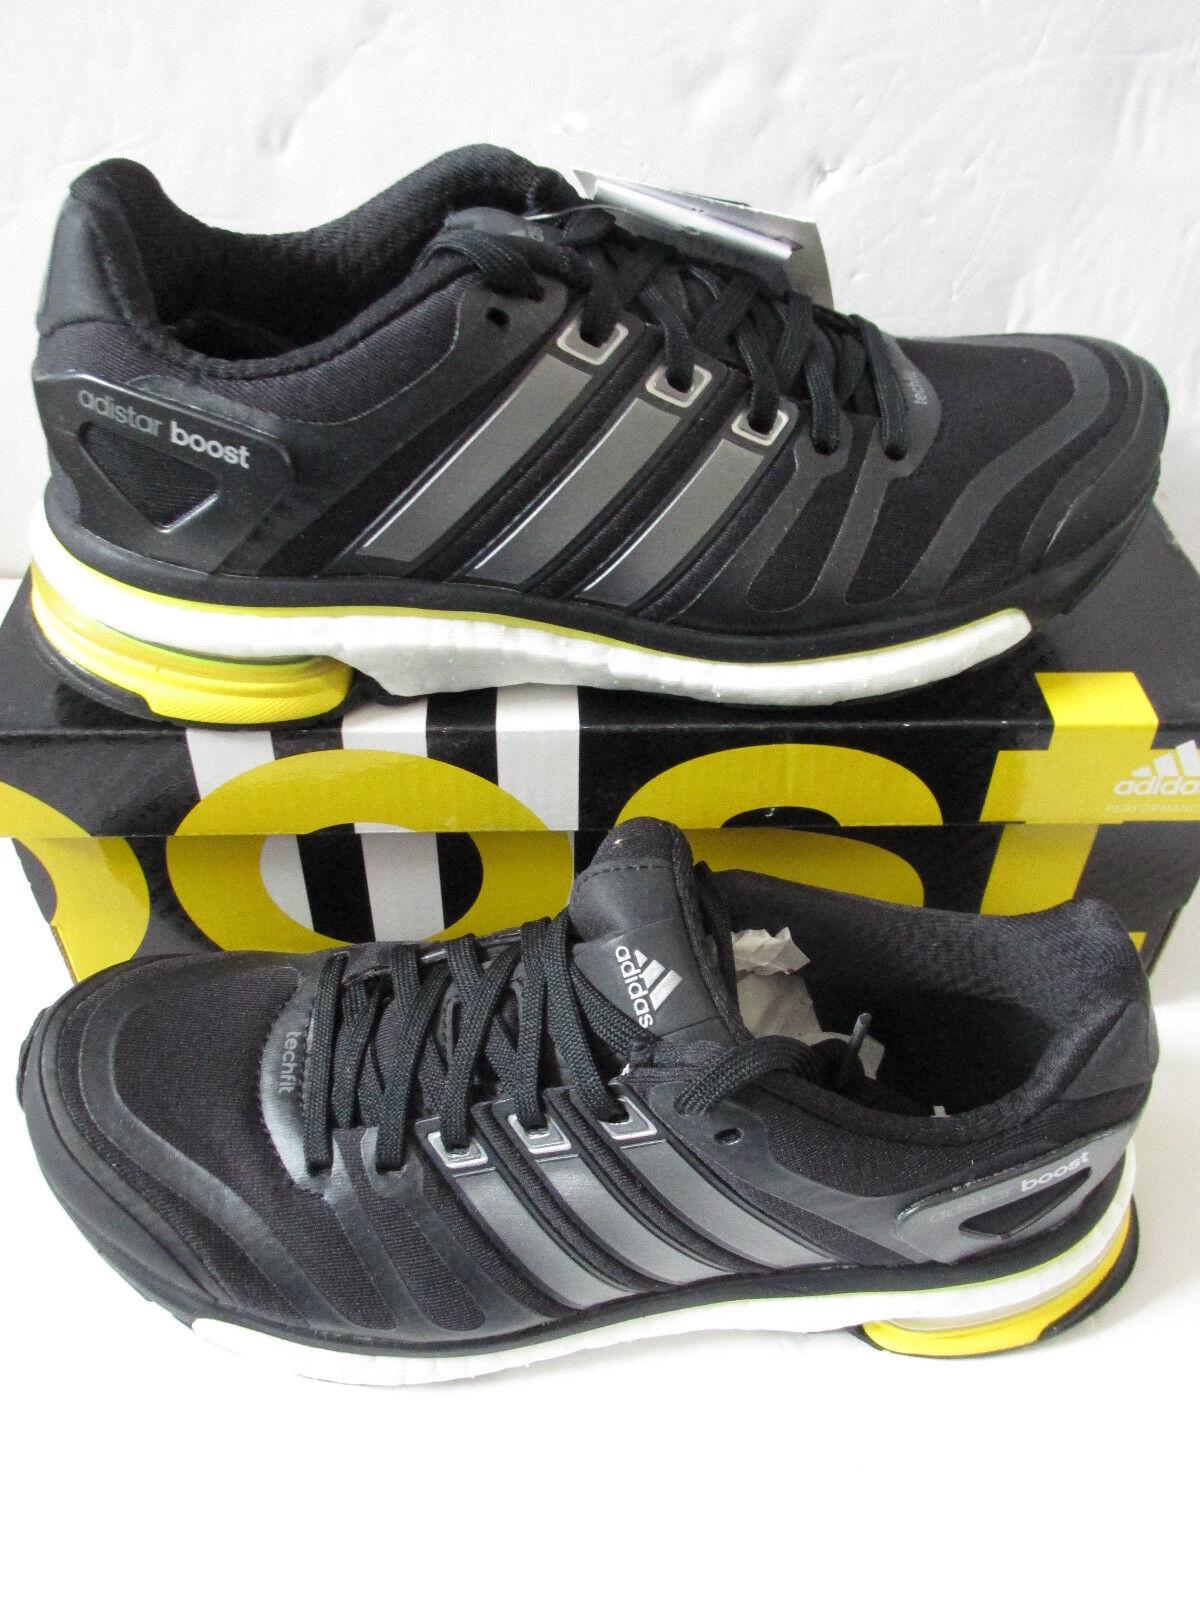 Adidas Adistar Boost W Donna Scarpe da Ginnastica Corsa Q21117 Scarpe da Ginnastica